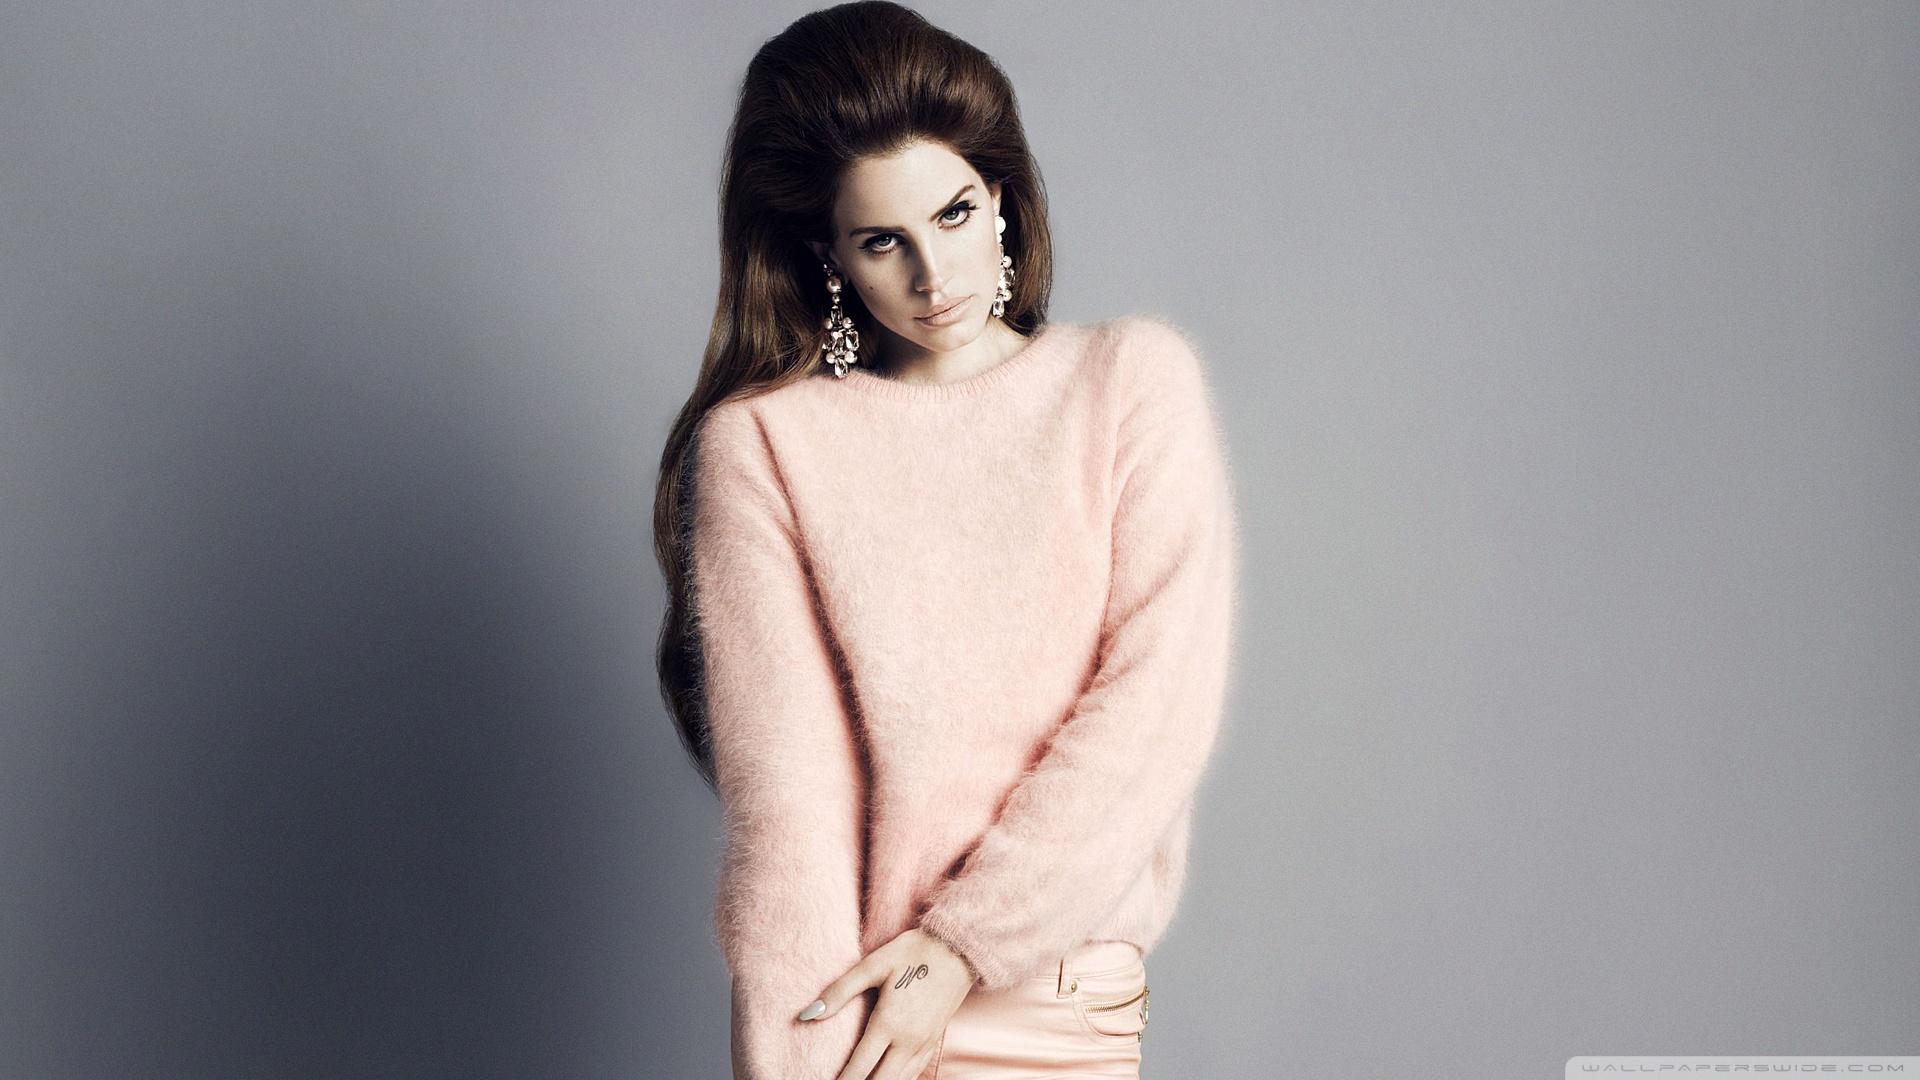 Lana Del Rey Desktop Background Posted By Michelle Cunningham